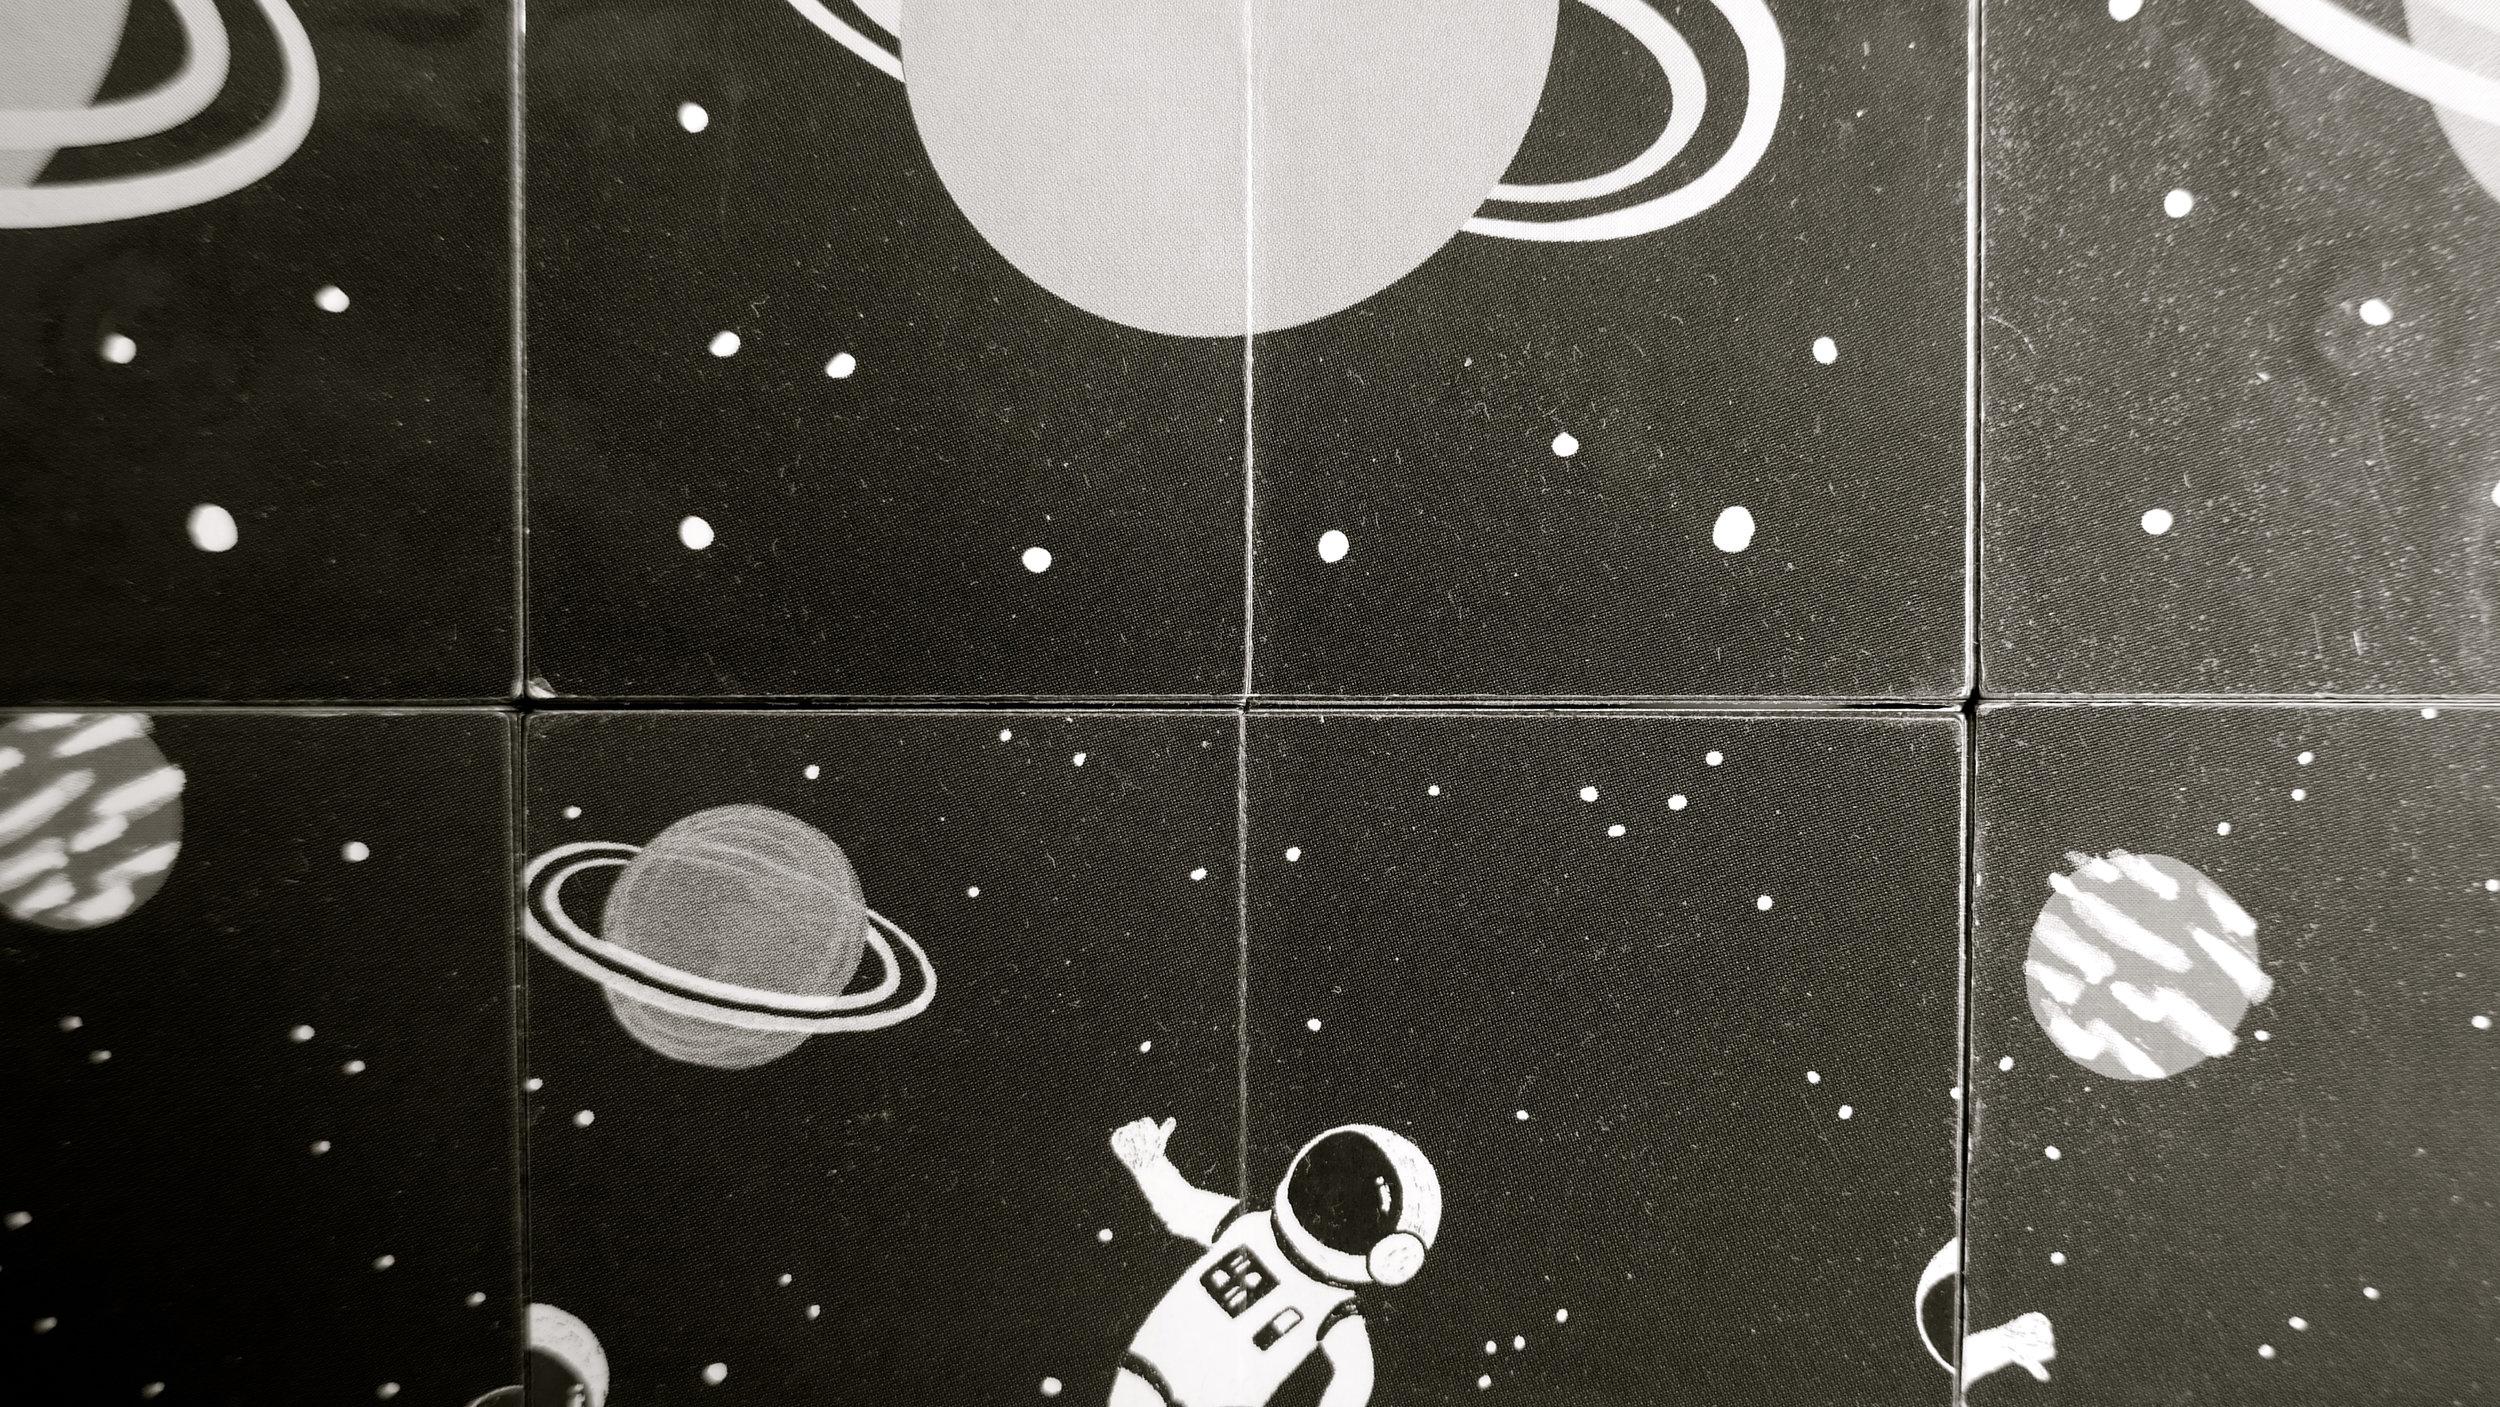 Astronautas rompecabezas articulado - 2